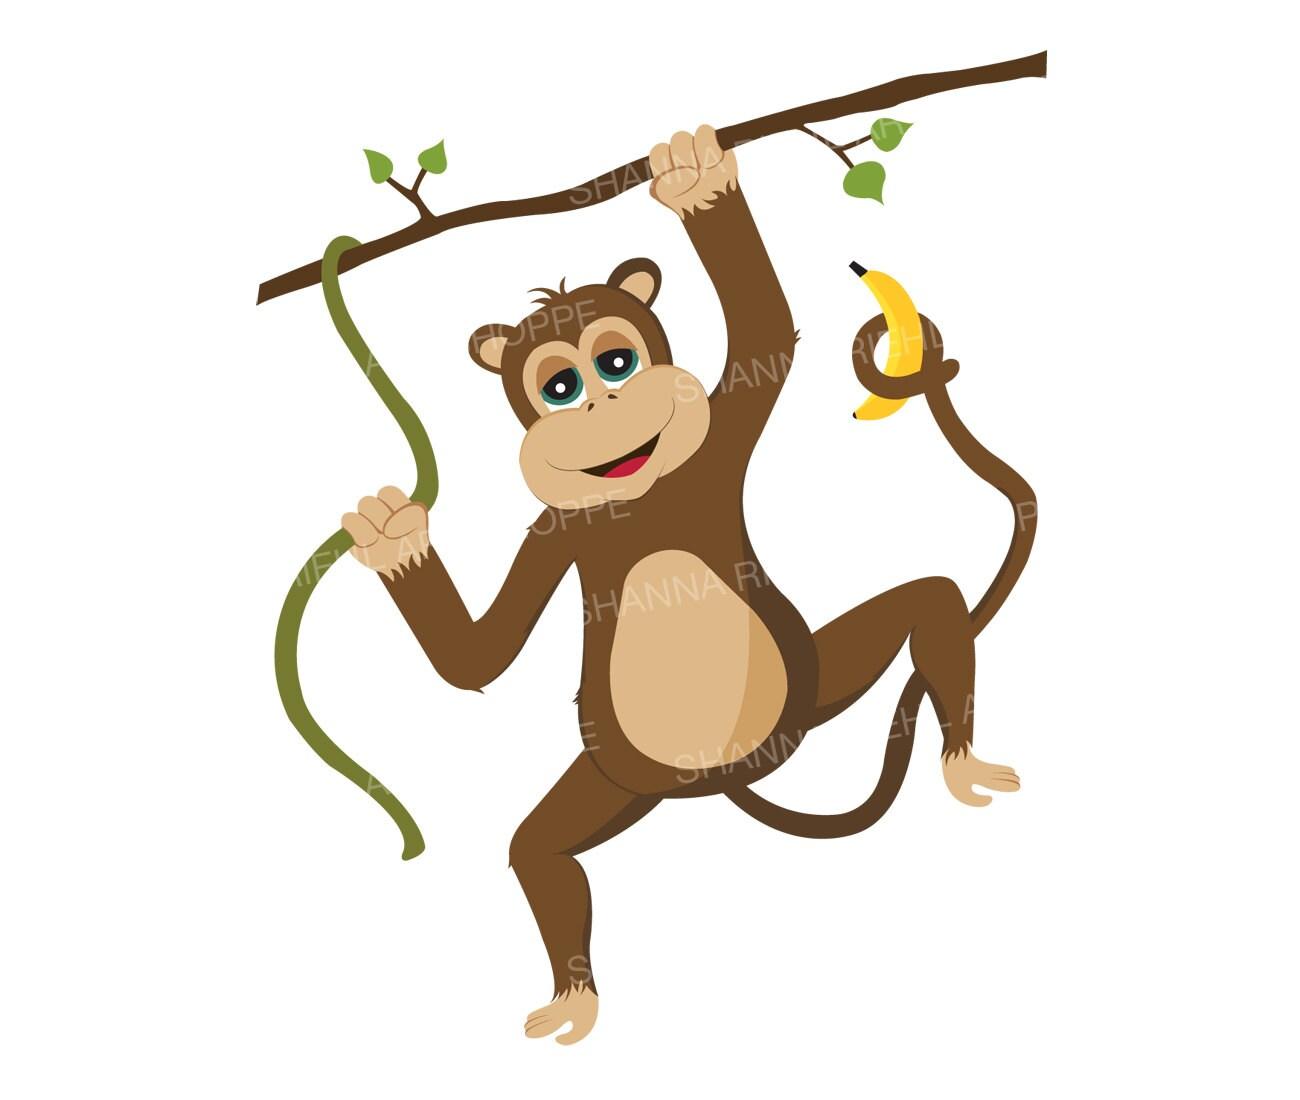 Monkey Clipart | Safari Animals Printable Art | Commercial ...